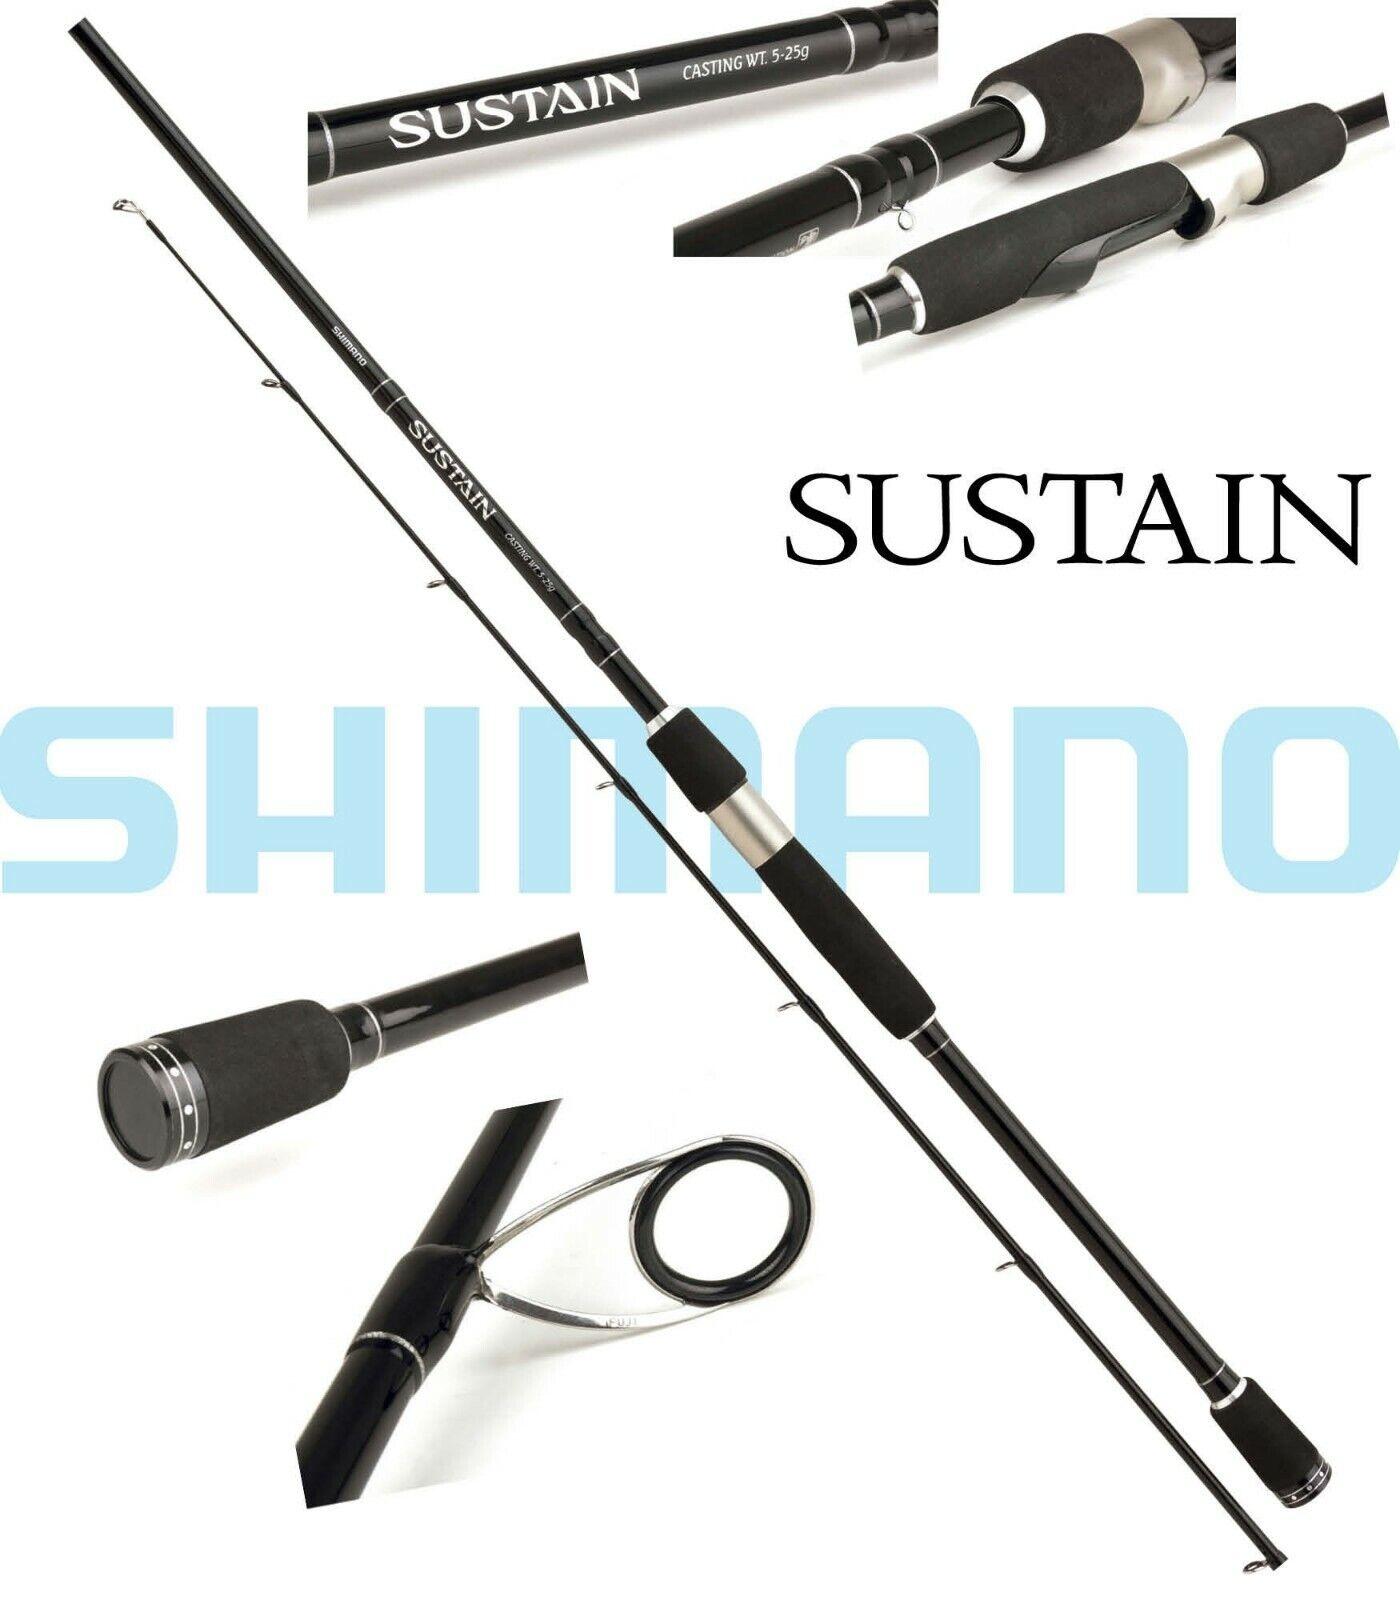 Shimano Sustain Spinning, 2.70m, 7-28g, 2 teiil, Spinnrute, SSUS27728